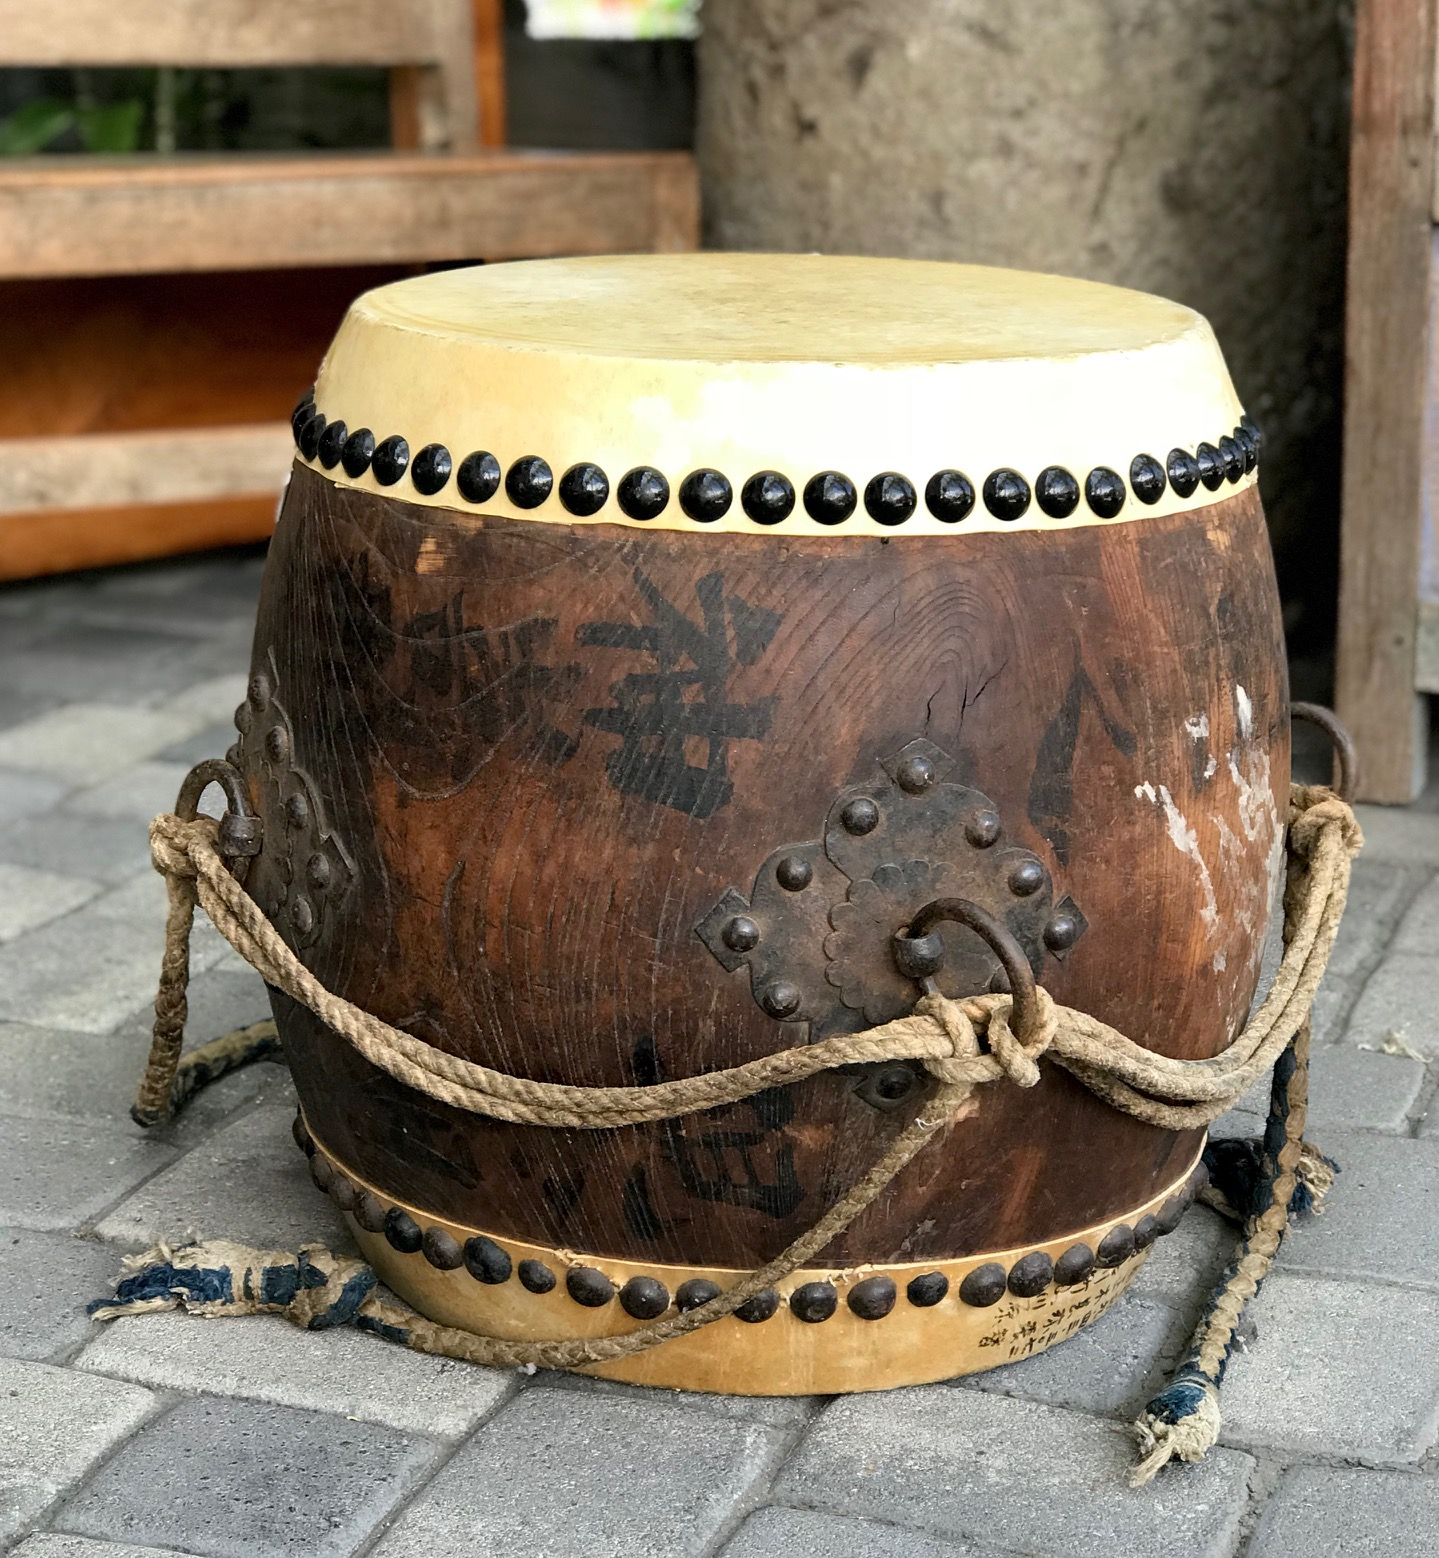 "Japanese Taiko Style (tacked down) Drum, Japan, 19th c Edo Period, (new head skin and tacks), wood, rawhide, rope, iron rings and tacks, ink/paint, 20"" x 24"", $1200.; thedavidalancollection.com , solana beach, ca"